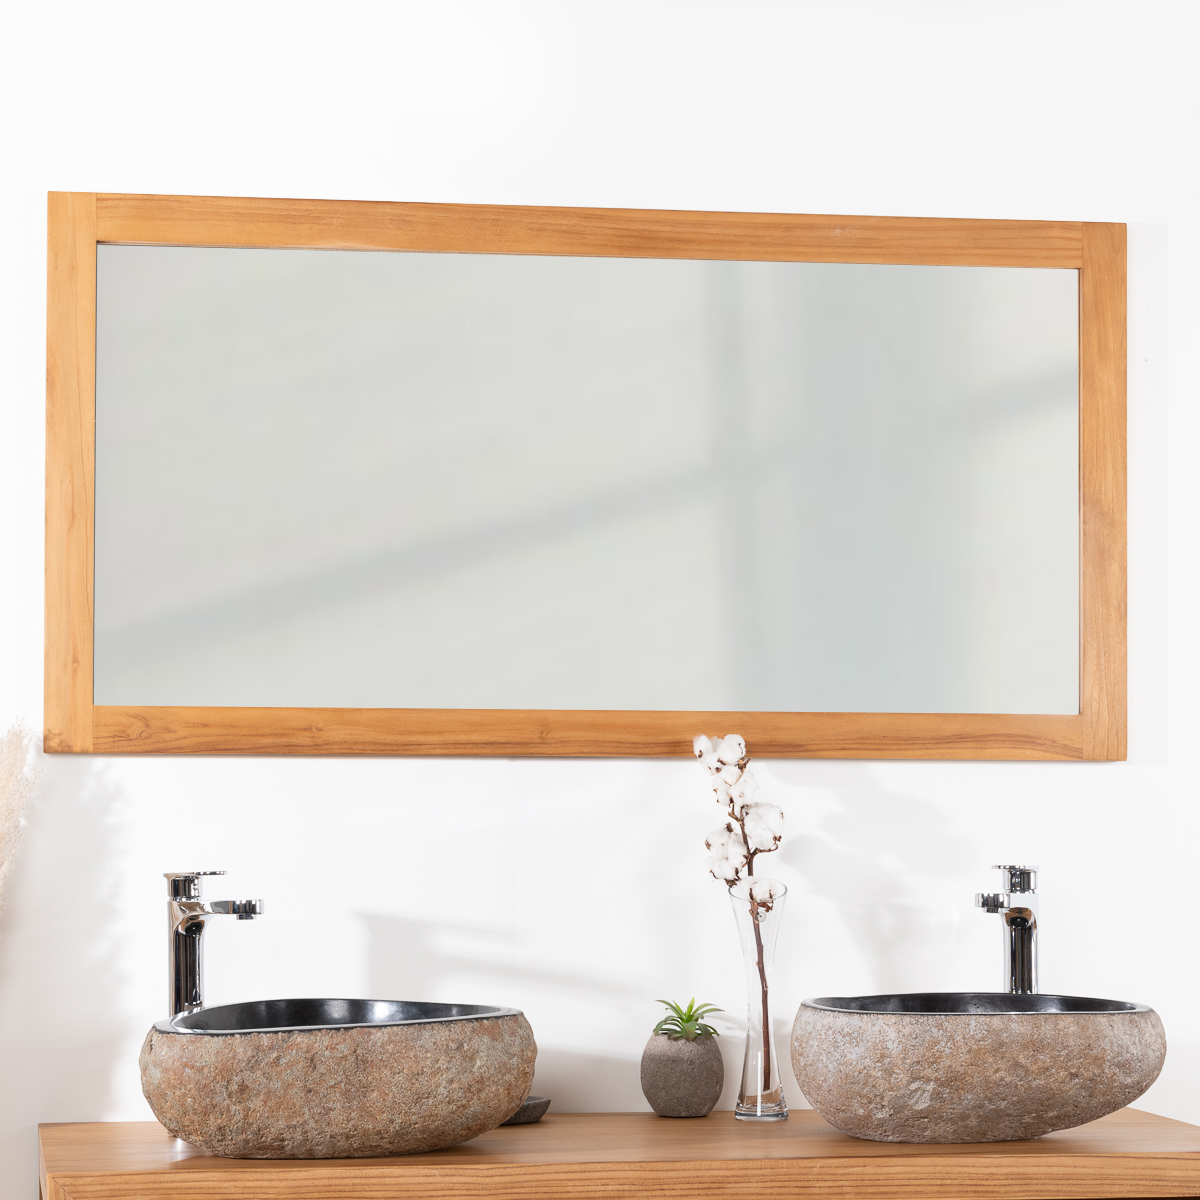 Miroir rectangle en teck massif 140x70 - Wanda collection ...